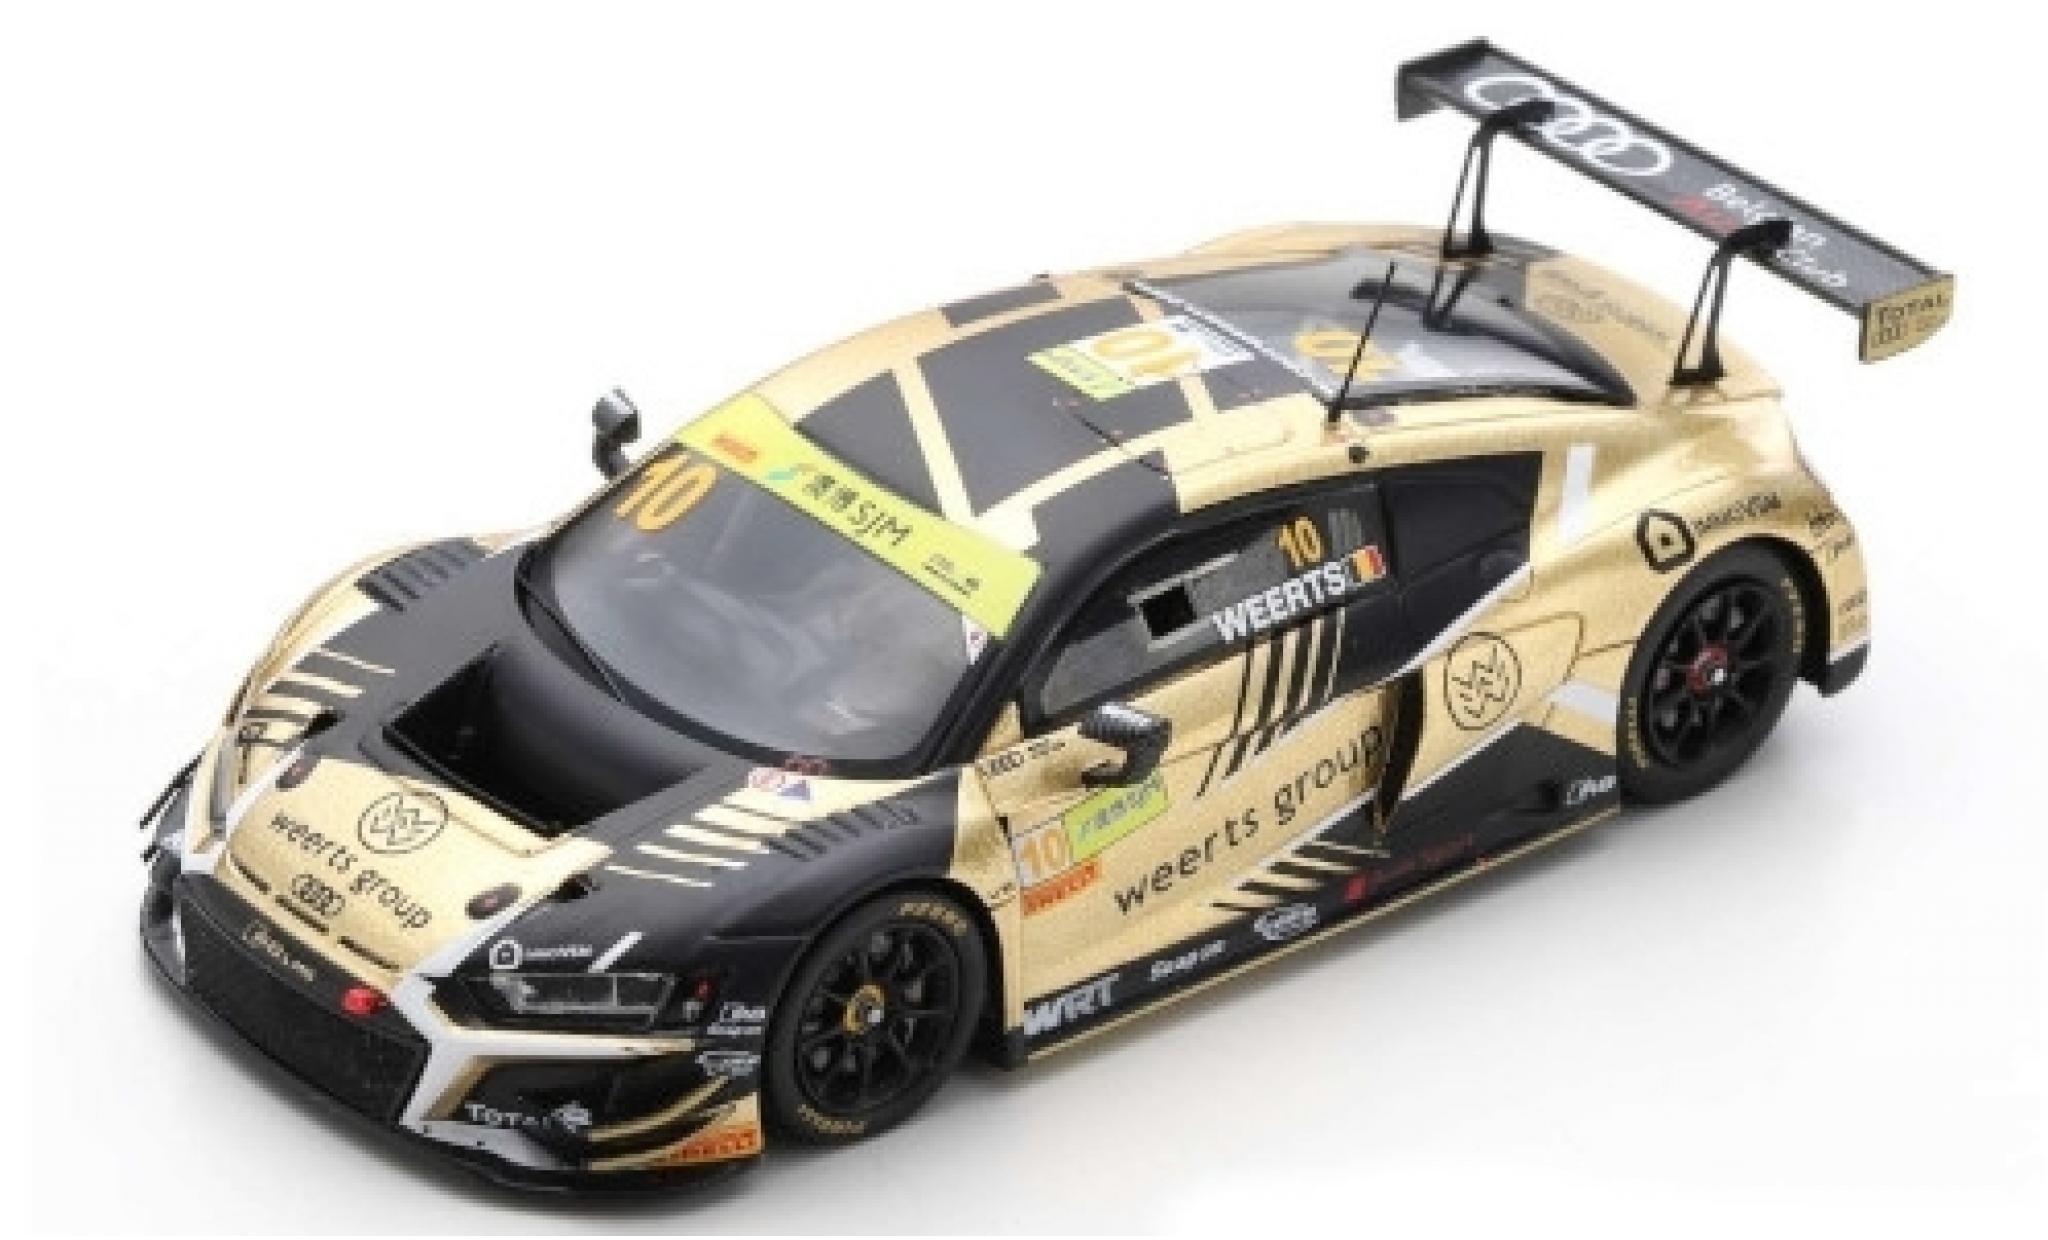 Audi R8 1/43 Spark LMS GT3 No.10 Team WRT Weerts Group Fia GT World Cup Macau 2019 C.Weerts